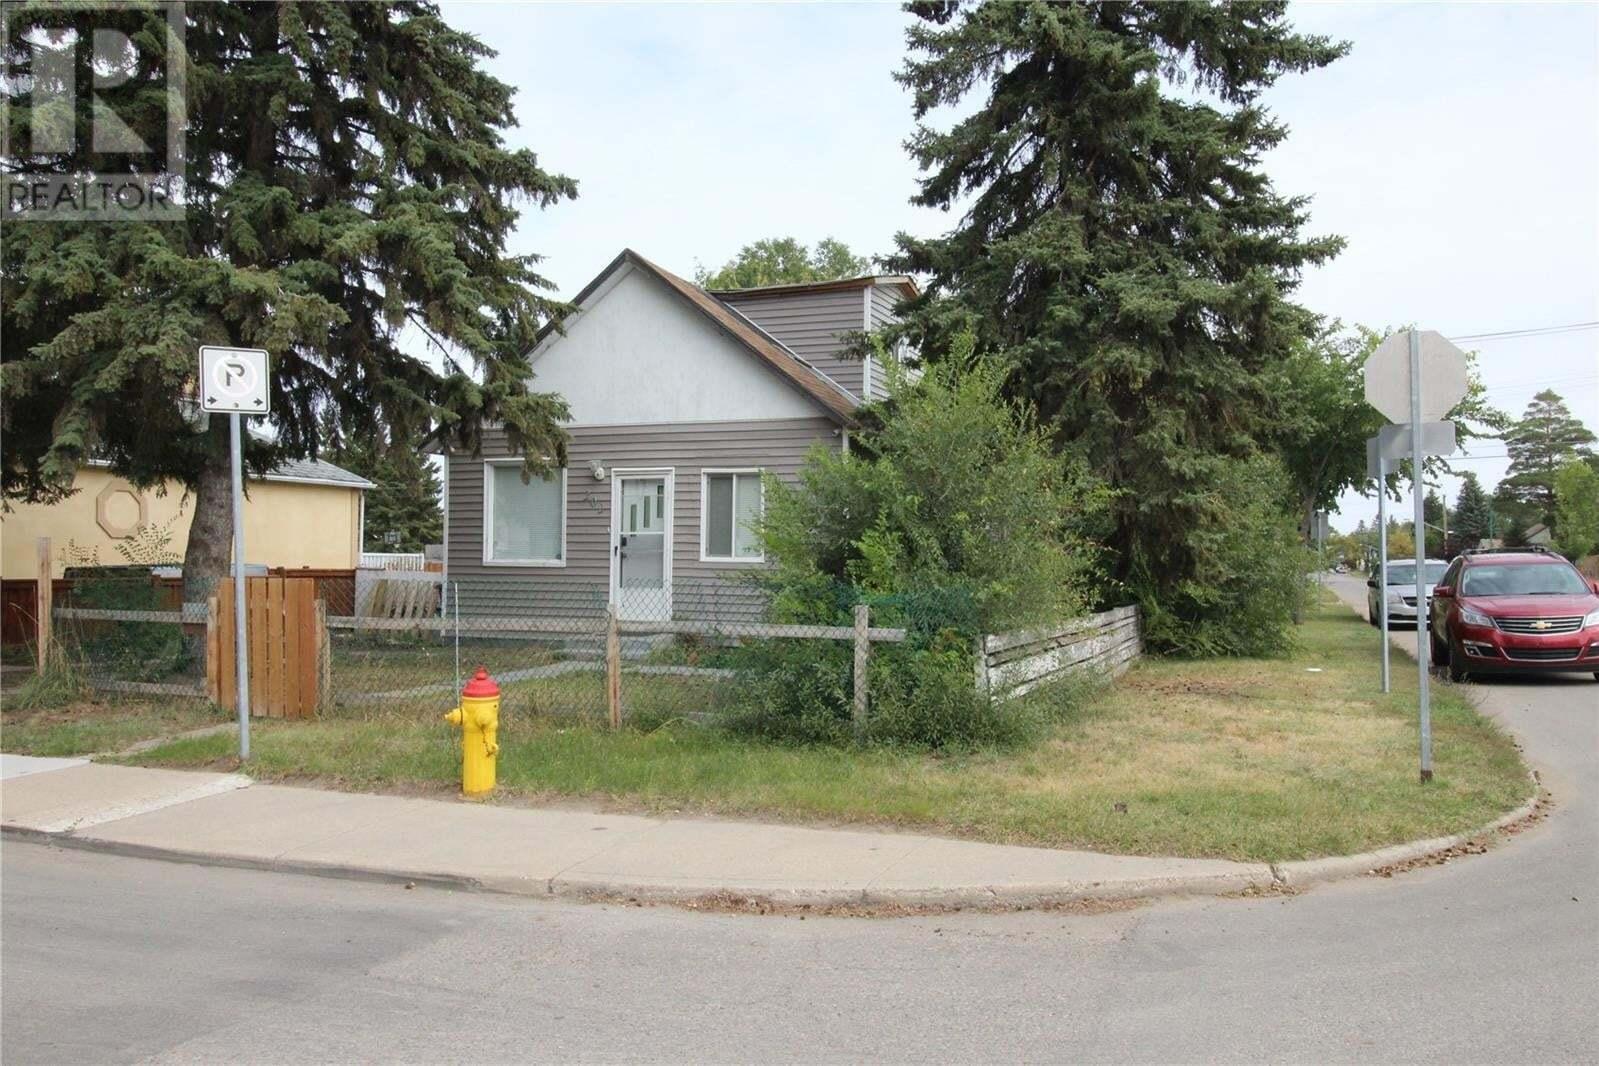 House for sale at 202 T Ave N Saskatoon Saskatchewan - MLS: SK826074